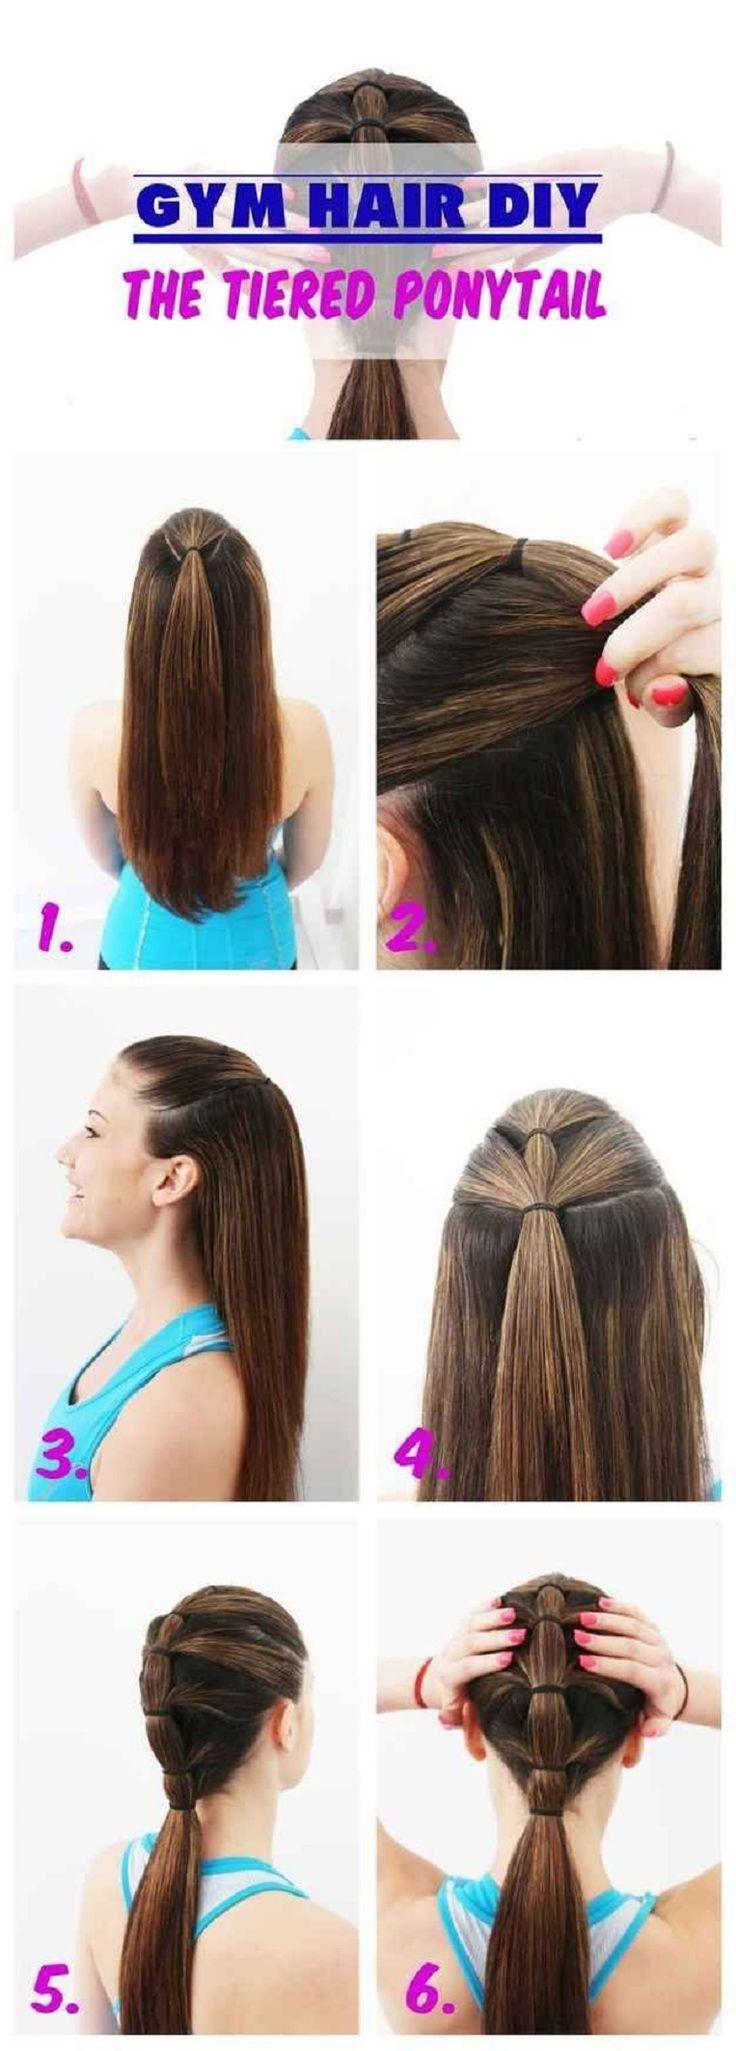 Liczba Najlepszych Obrazów Na Temat Yoga Hair Na Pintereście 14